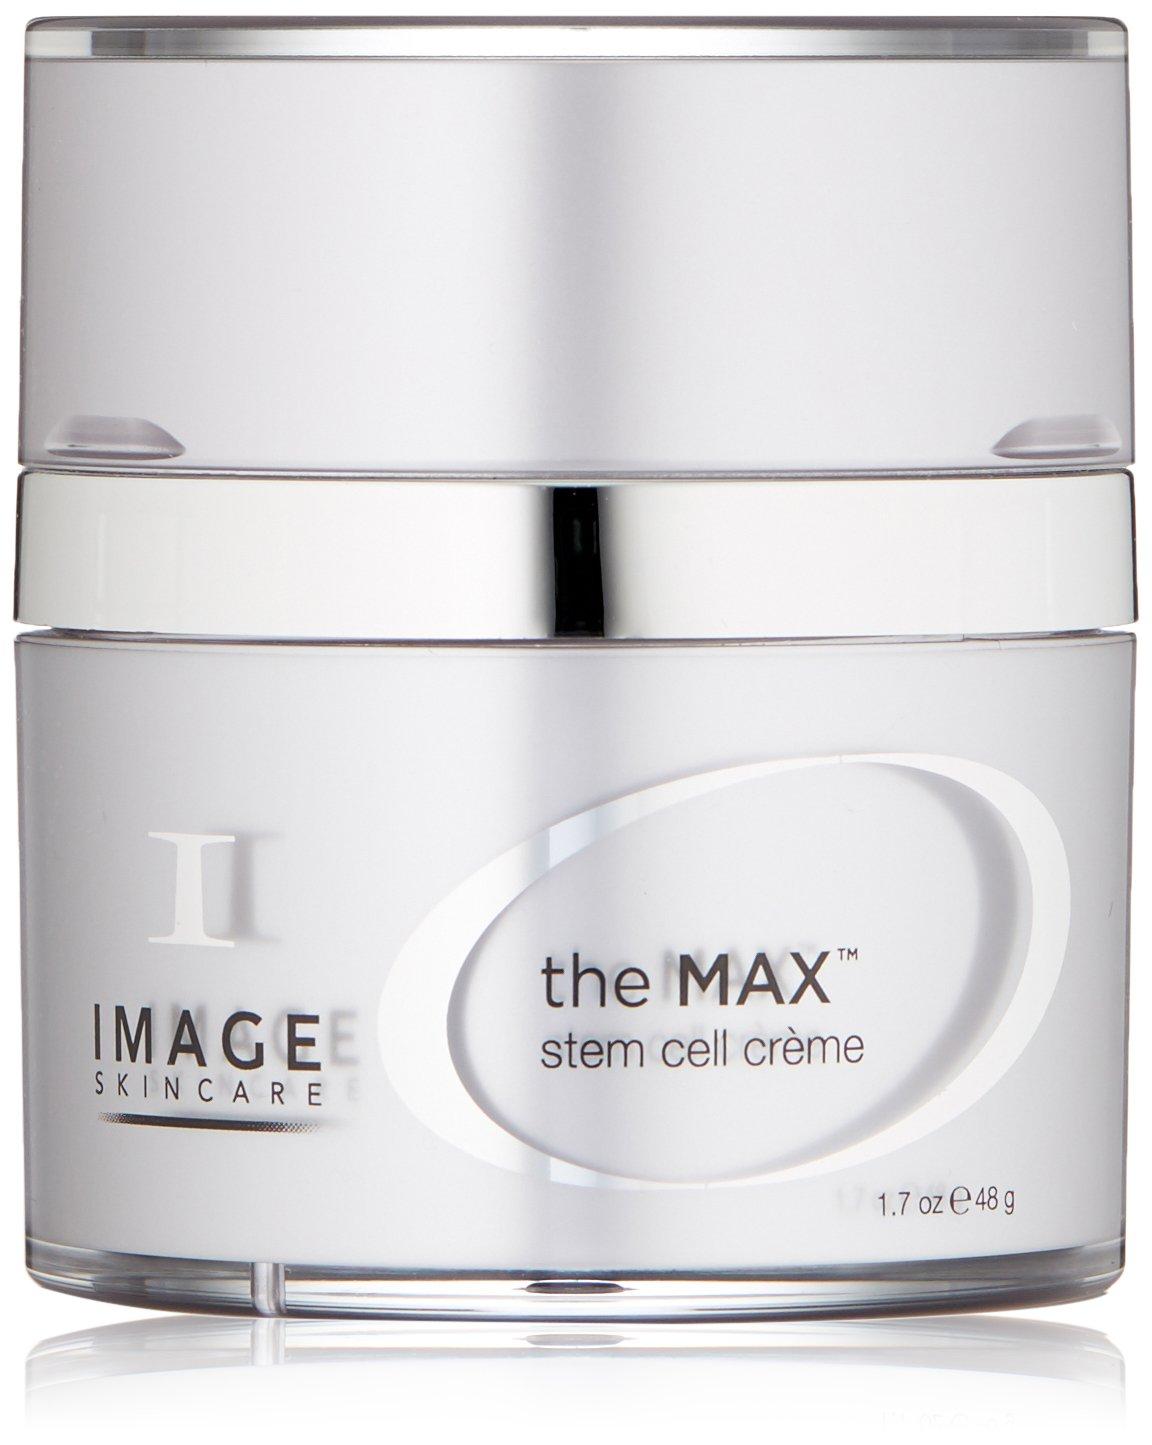 image skincare the max